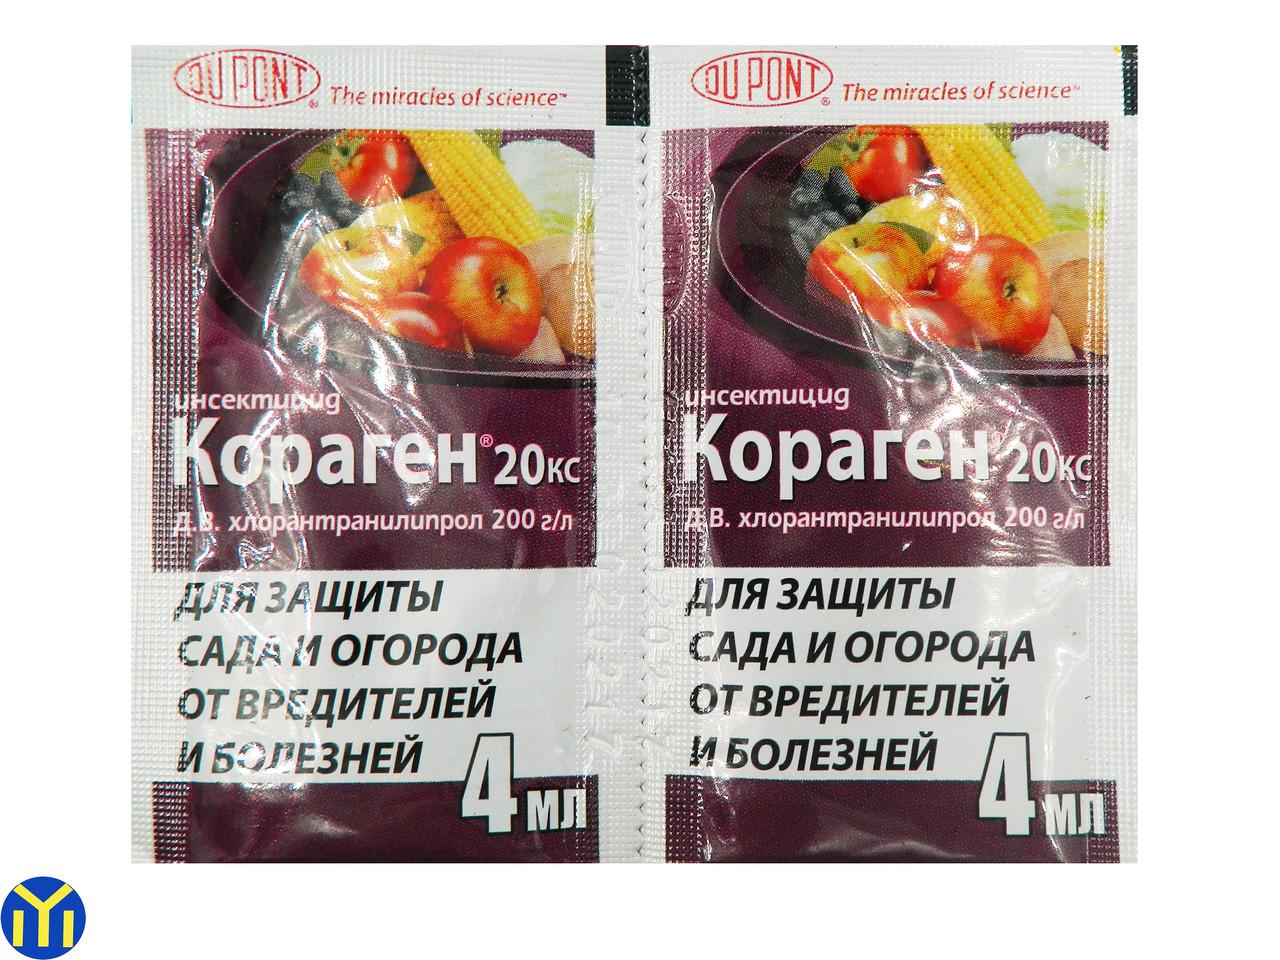 Кораген 20 кс 4 мл, инсектицид от вредителей для сада и огорода